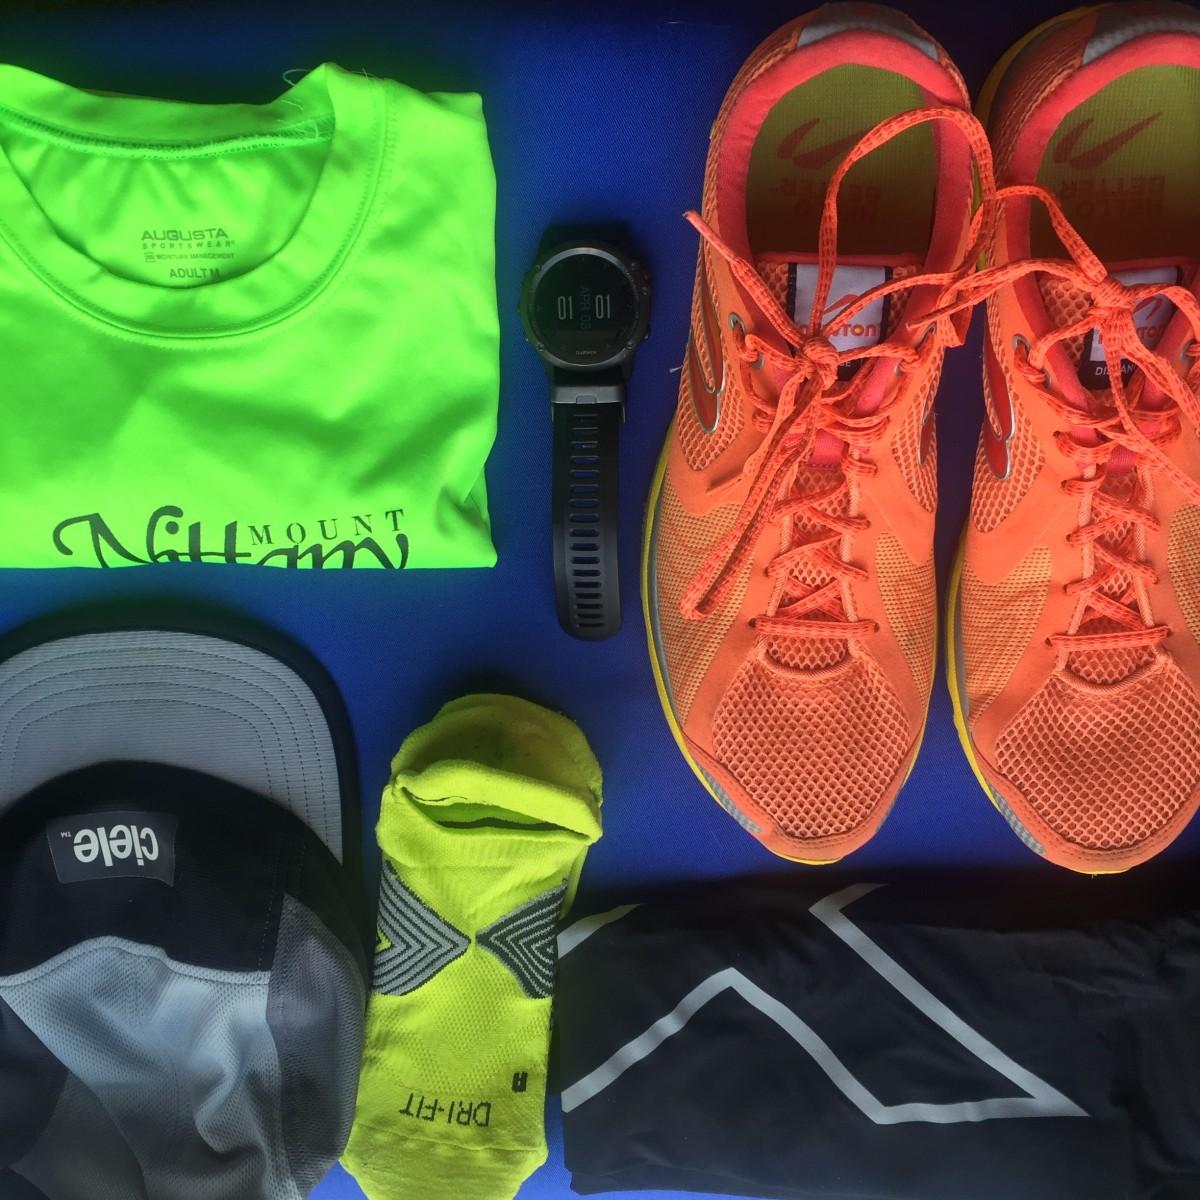 Race Recap – Egg Hill 10 miler2016